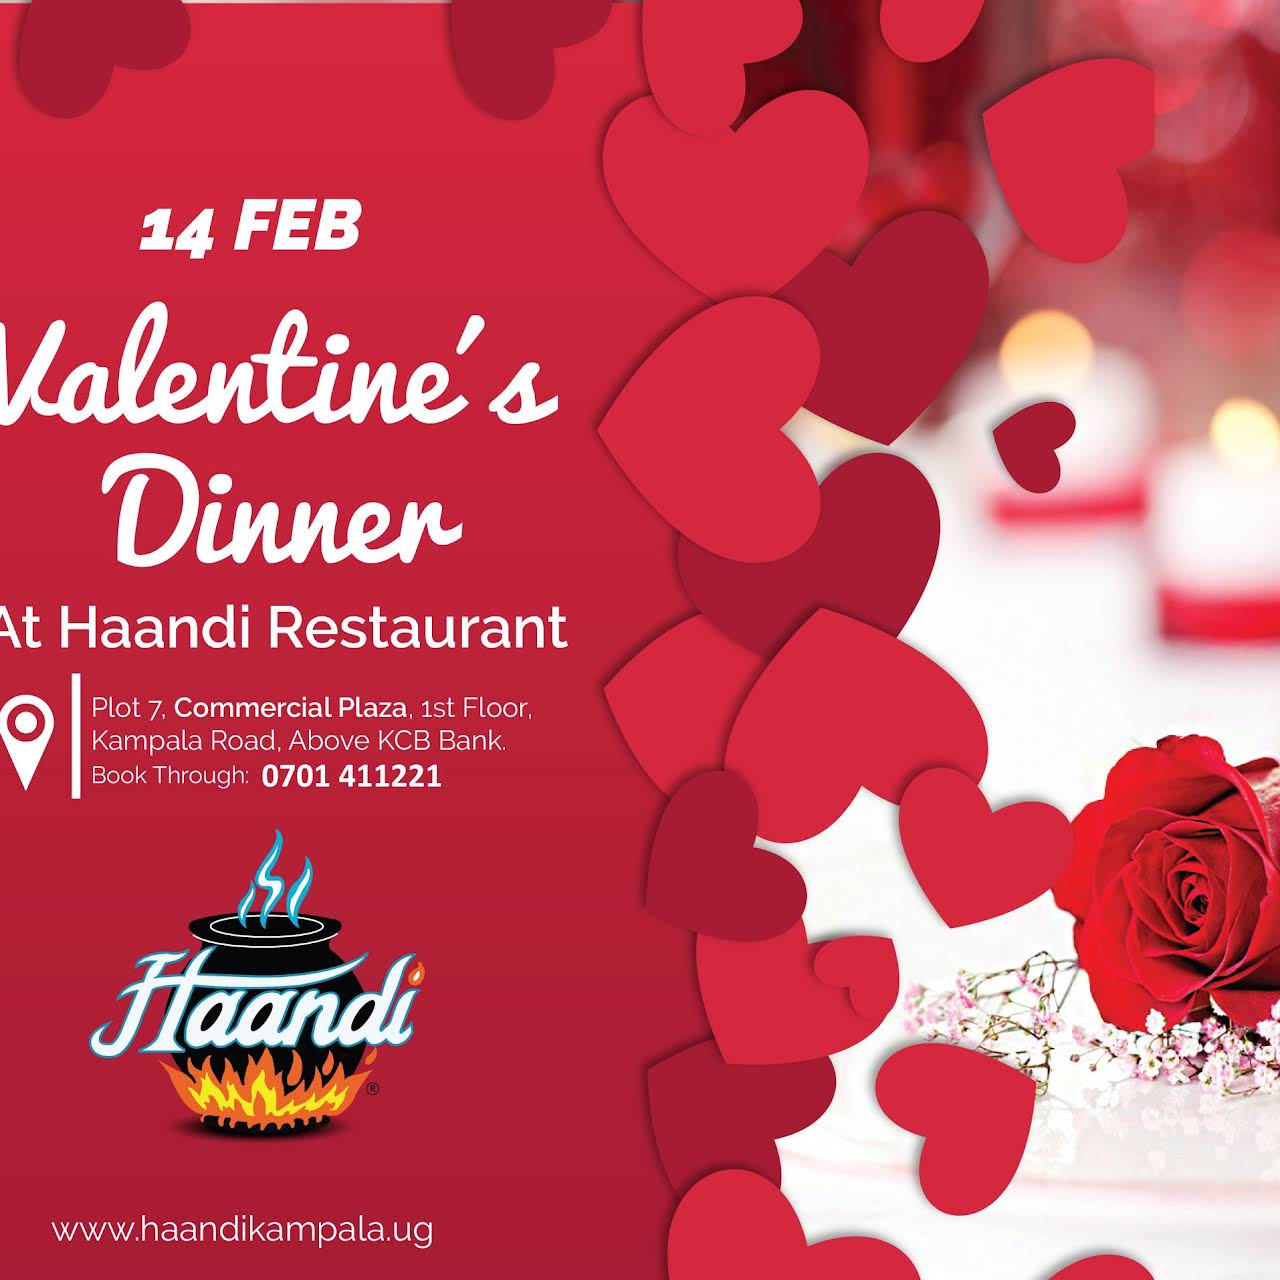 221721071596 Haandi kampala restaurant ltd - Indian Restaurant in Kampala